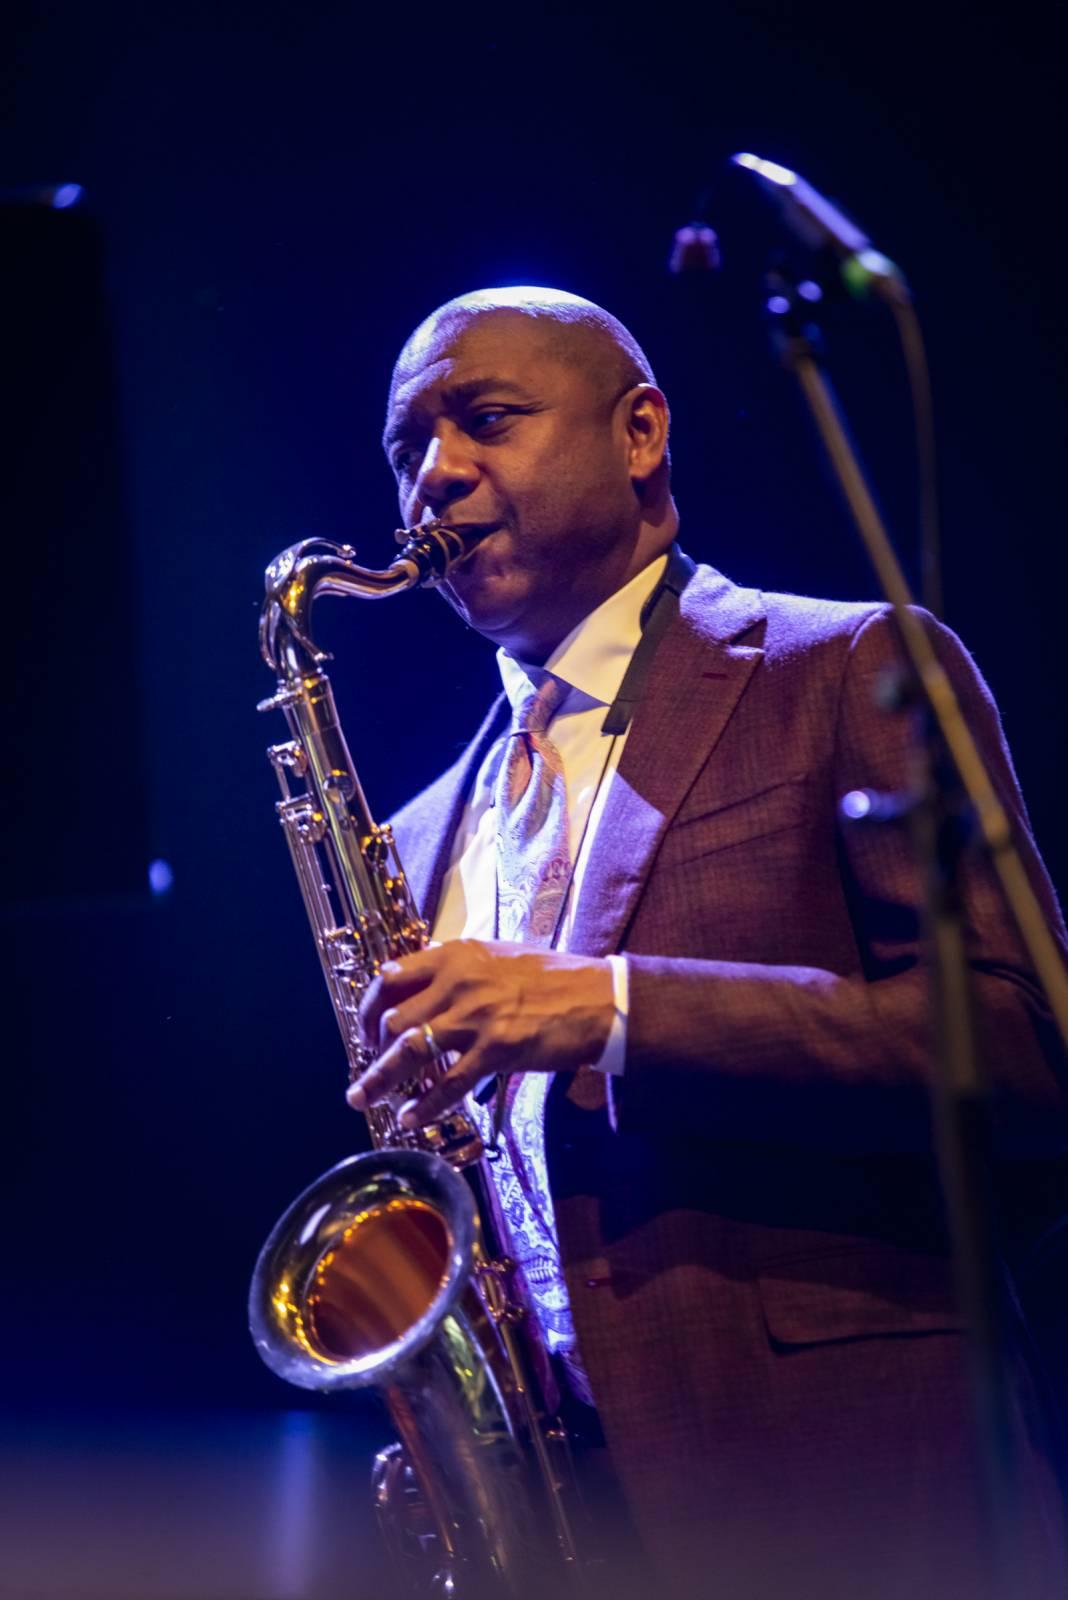 LIVE: JazzFest Brno zahájil v Sono centru Branford Marsalis